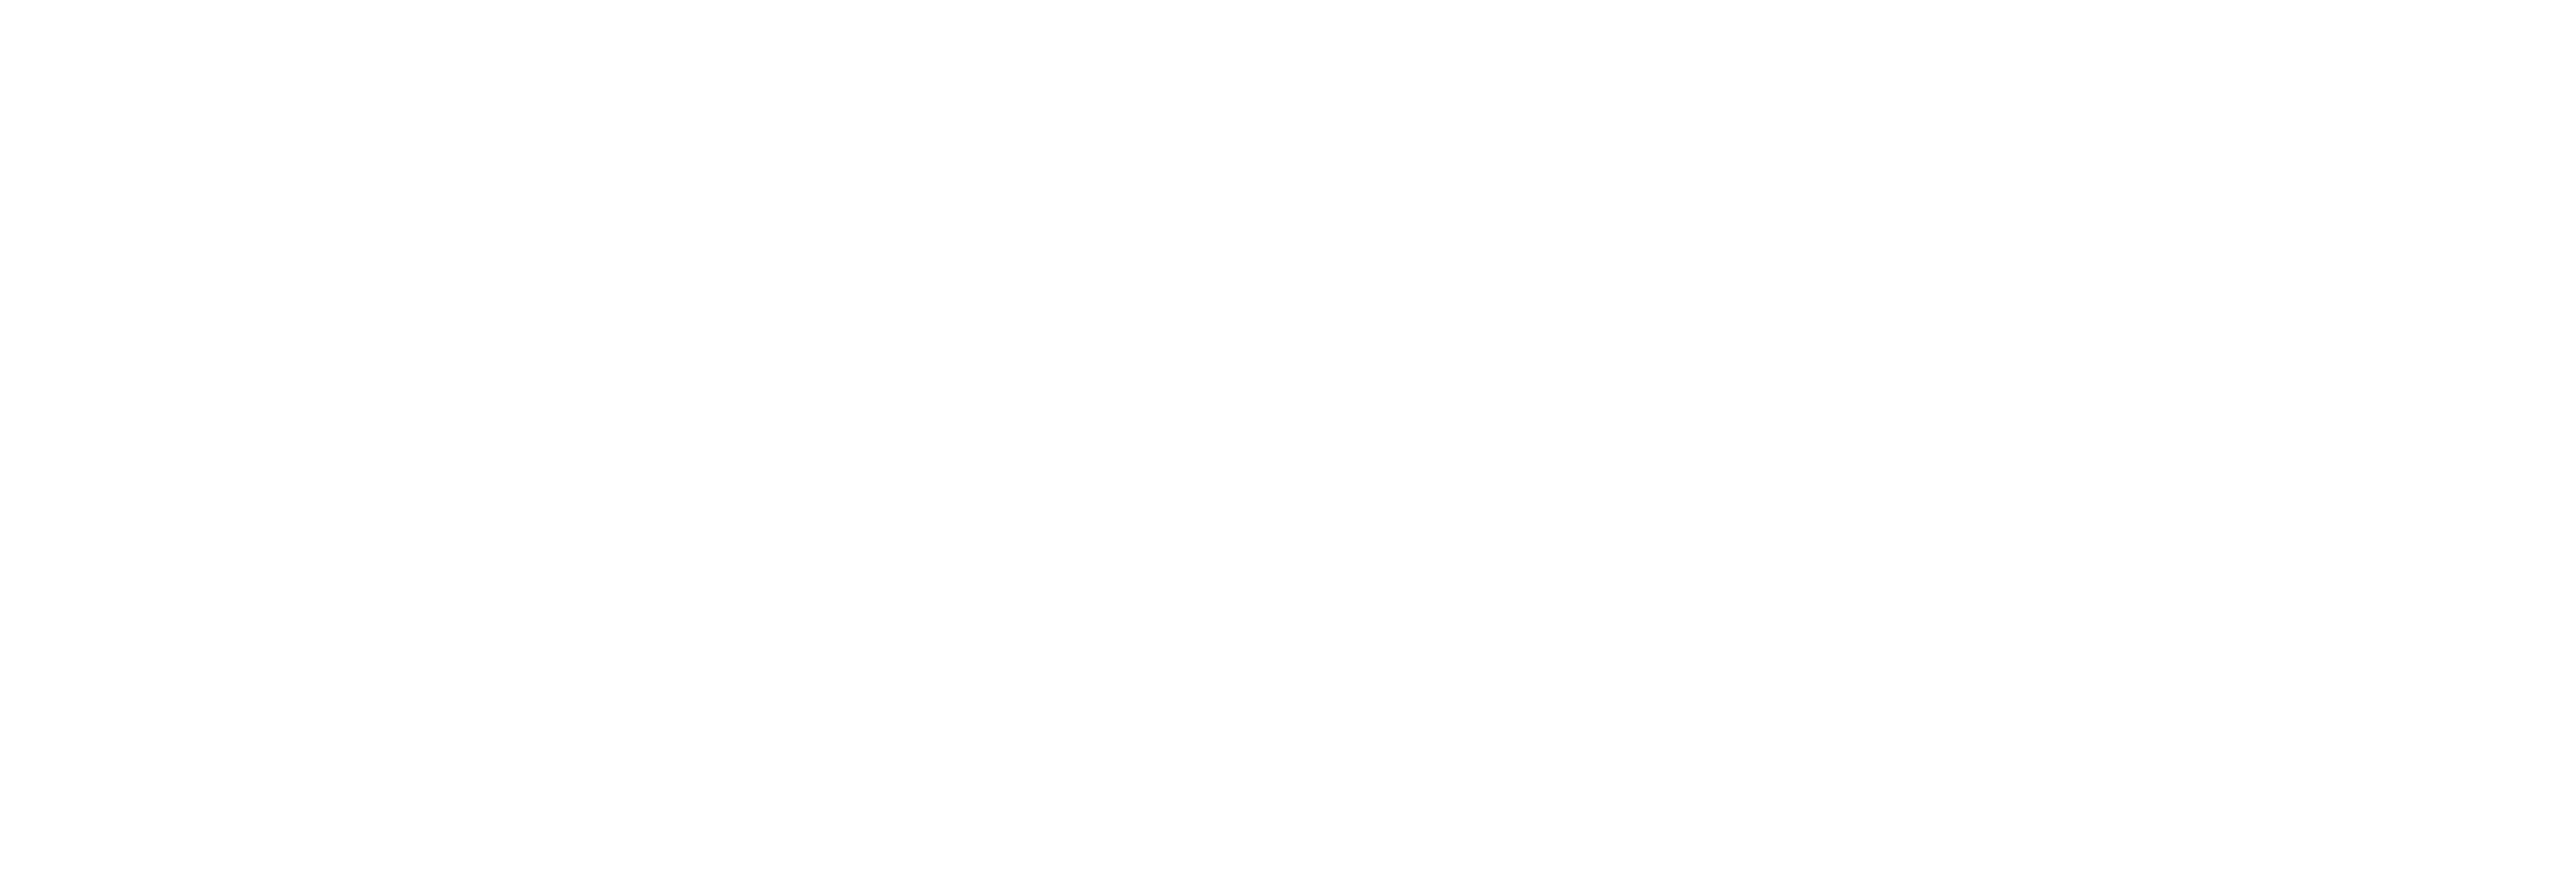 video_white